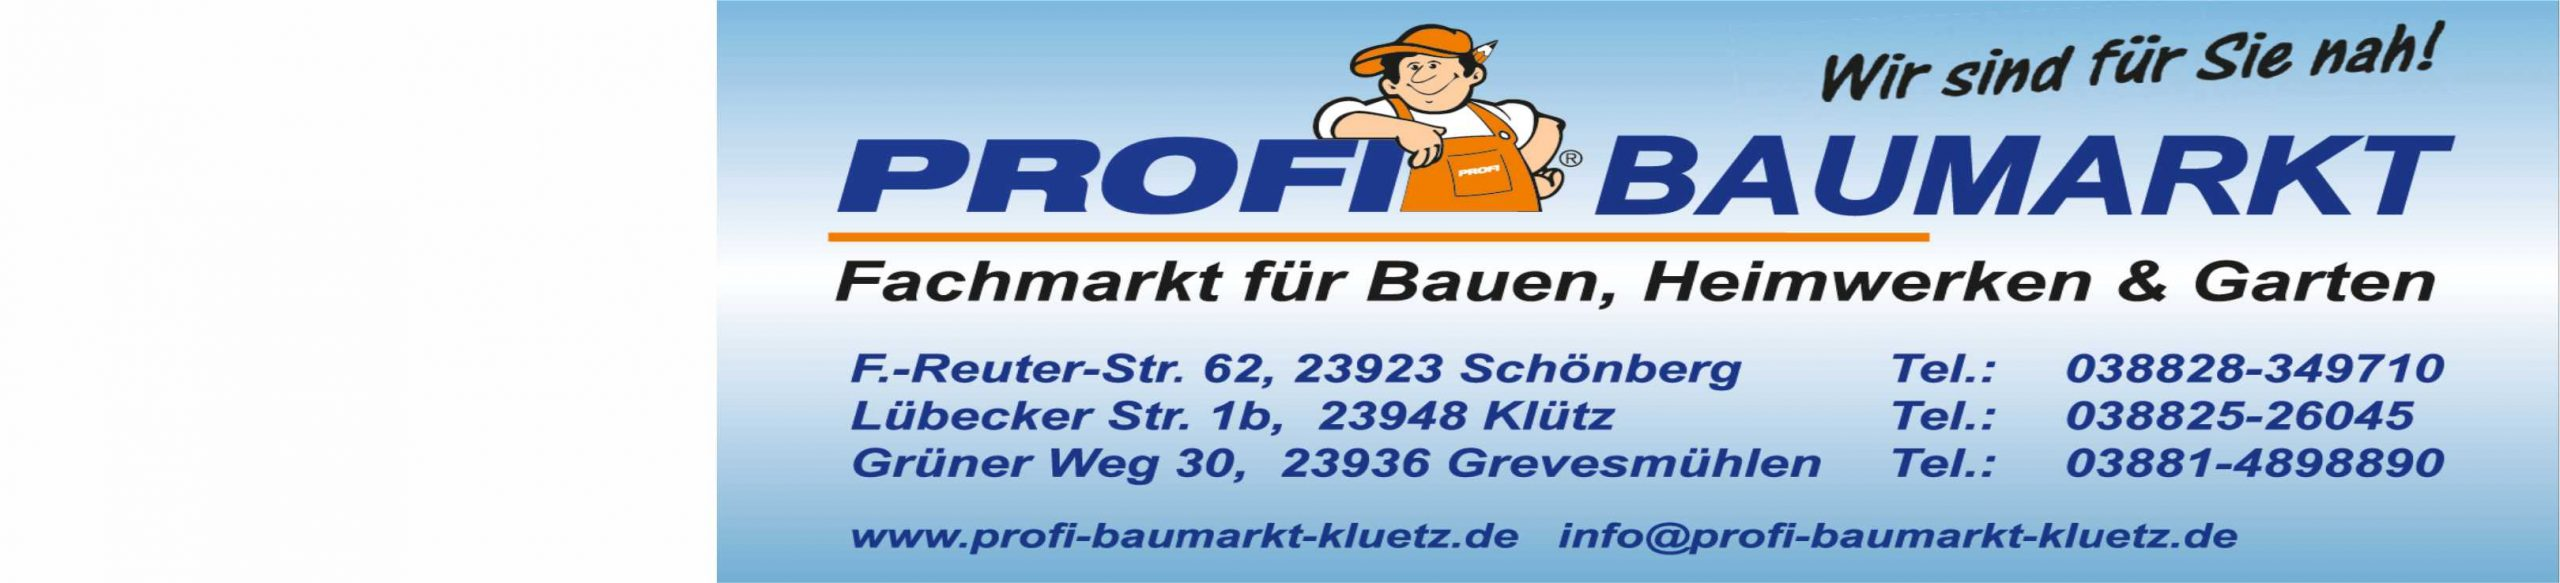 Profi-Baumarkt Klütz